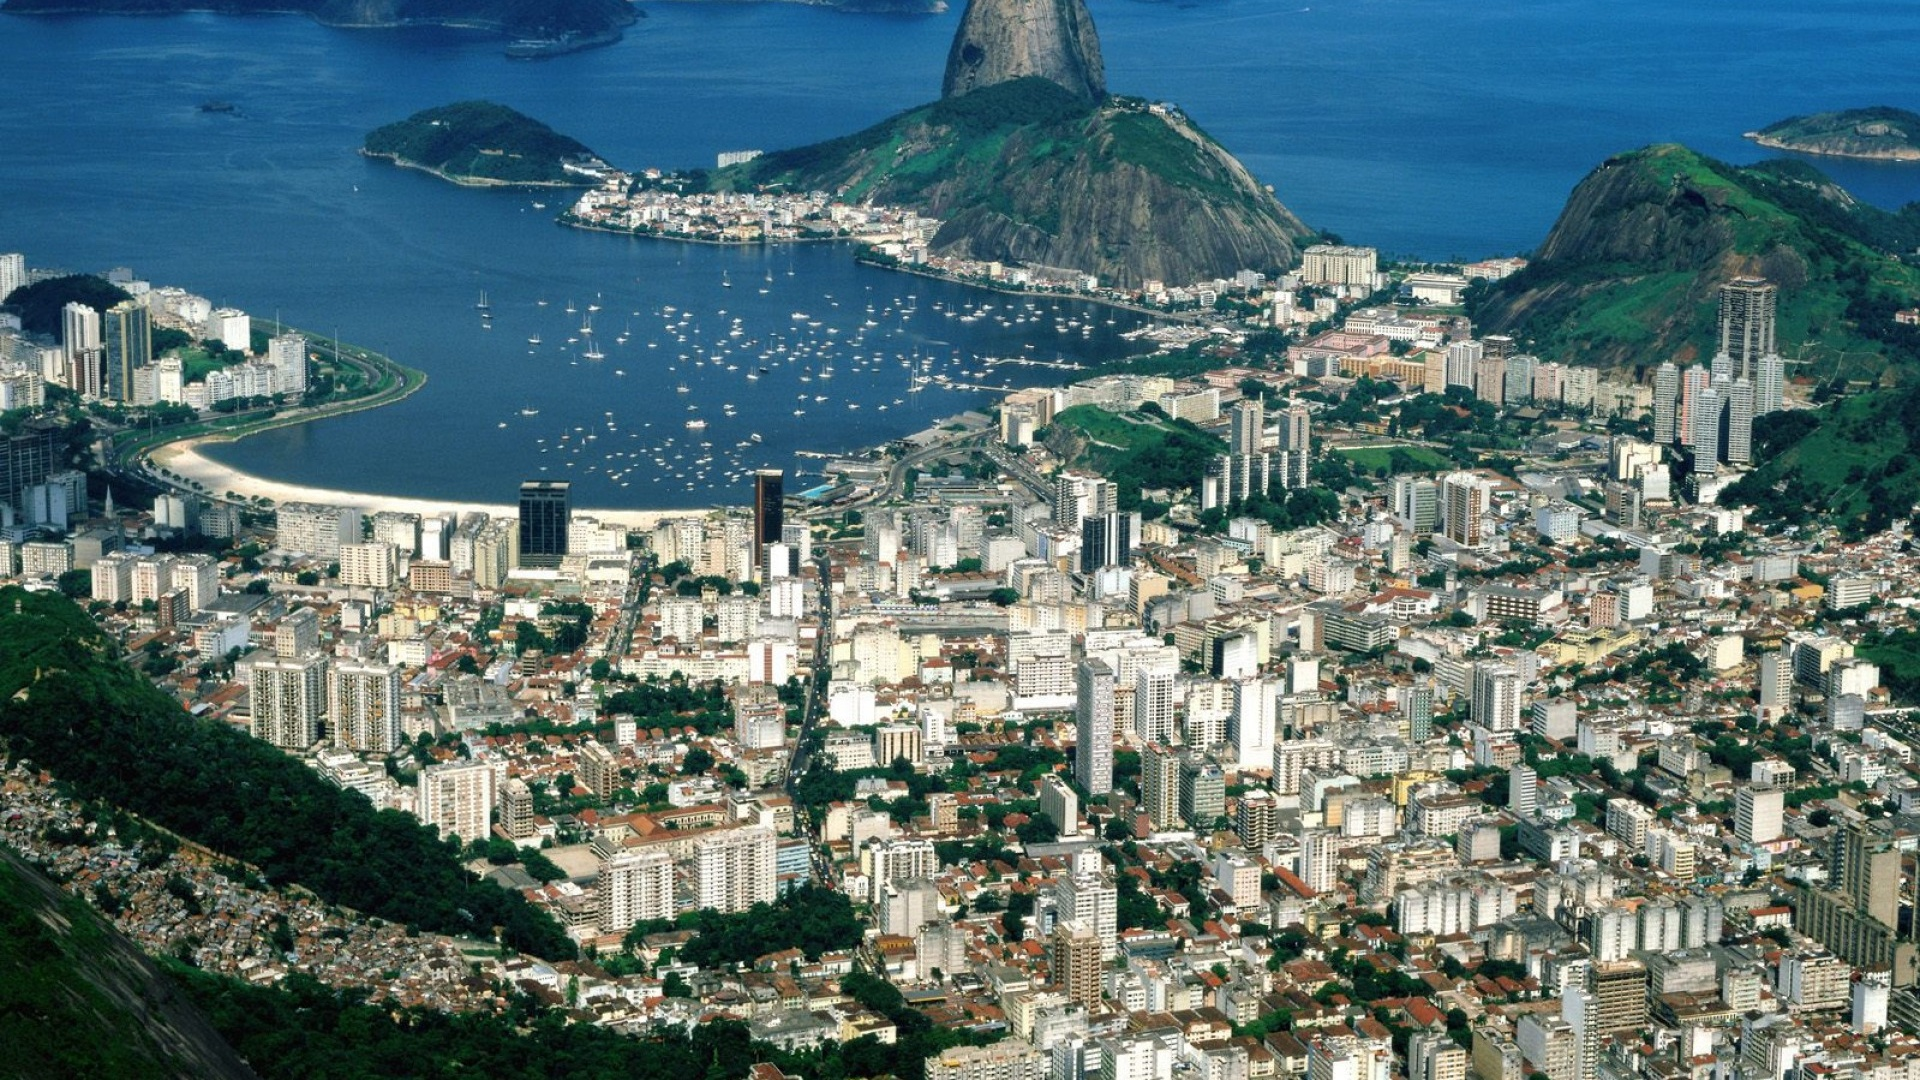 1920x1080 Rio De Janeiro desktop PC and Mac wallpaper 1920x1080